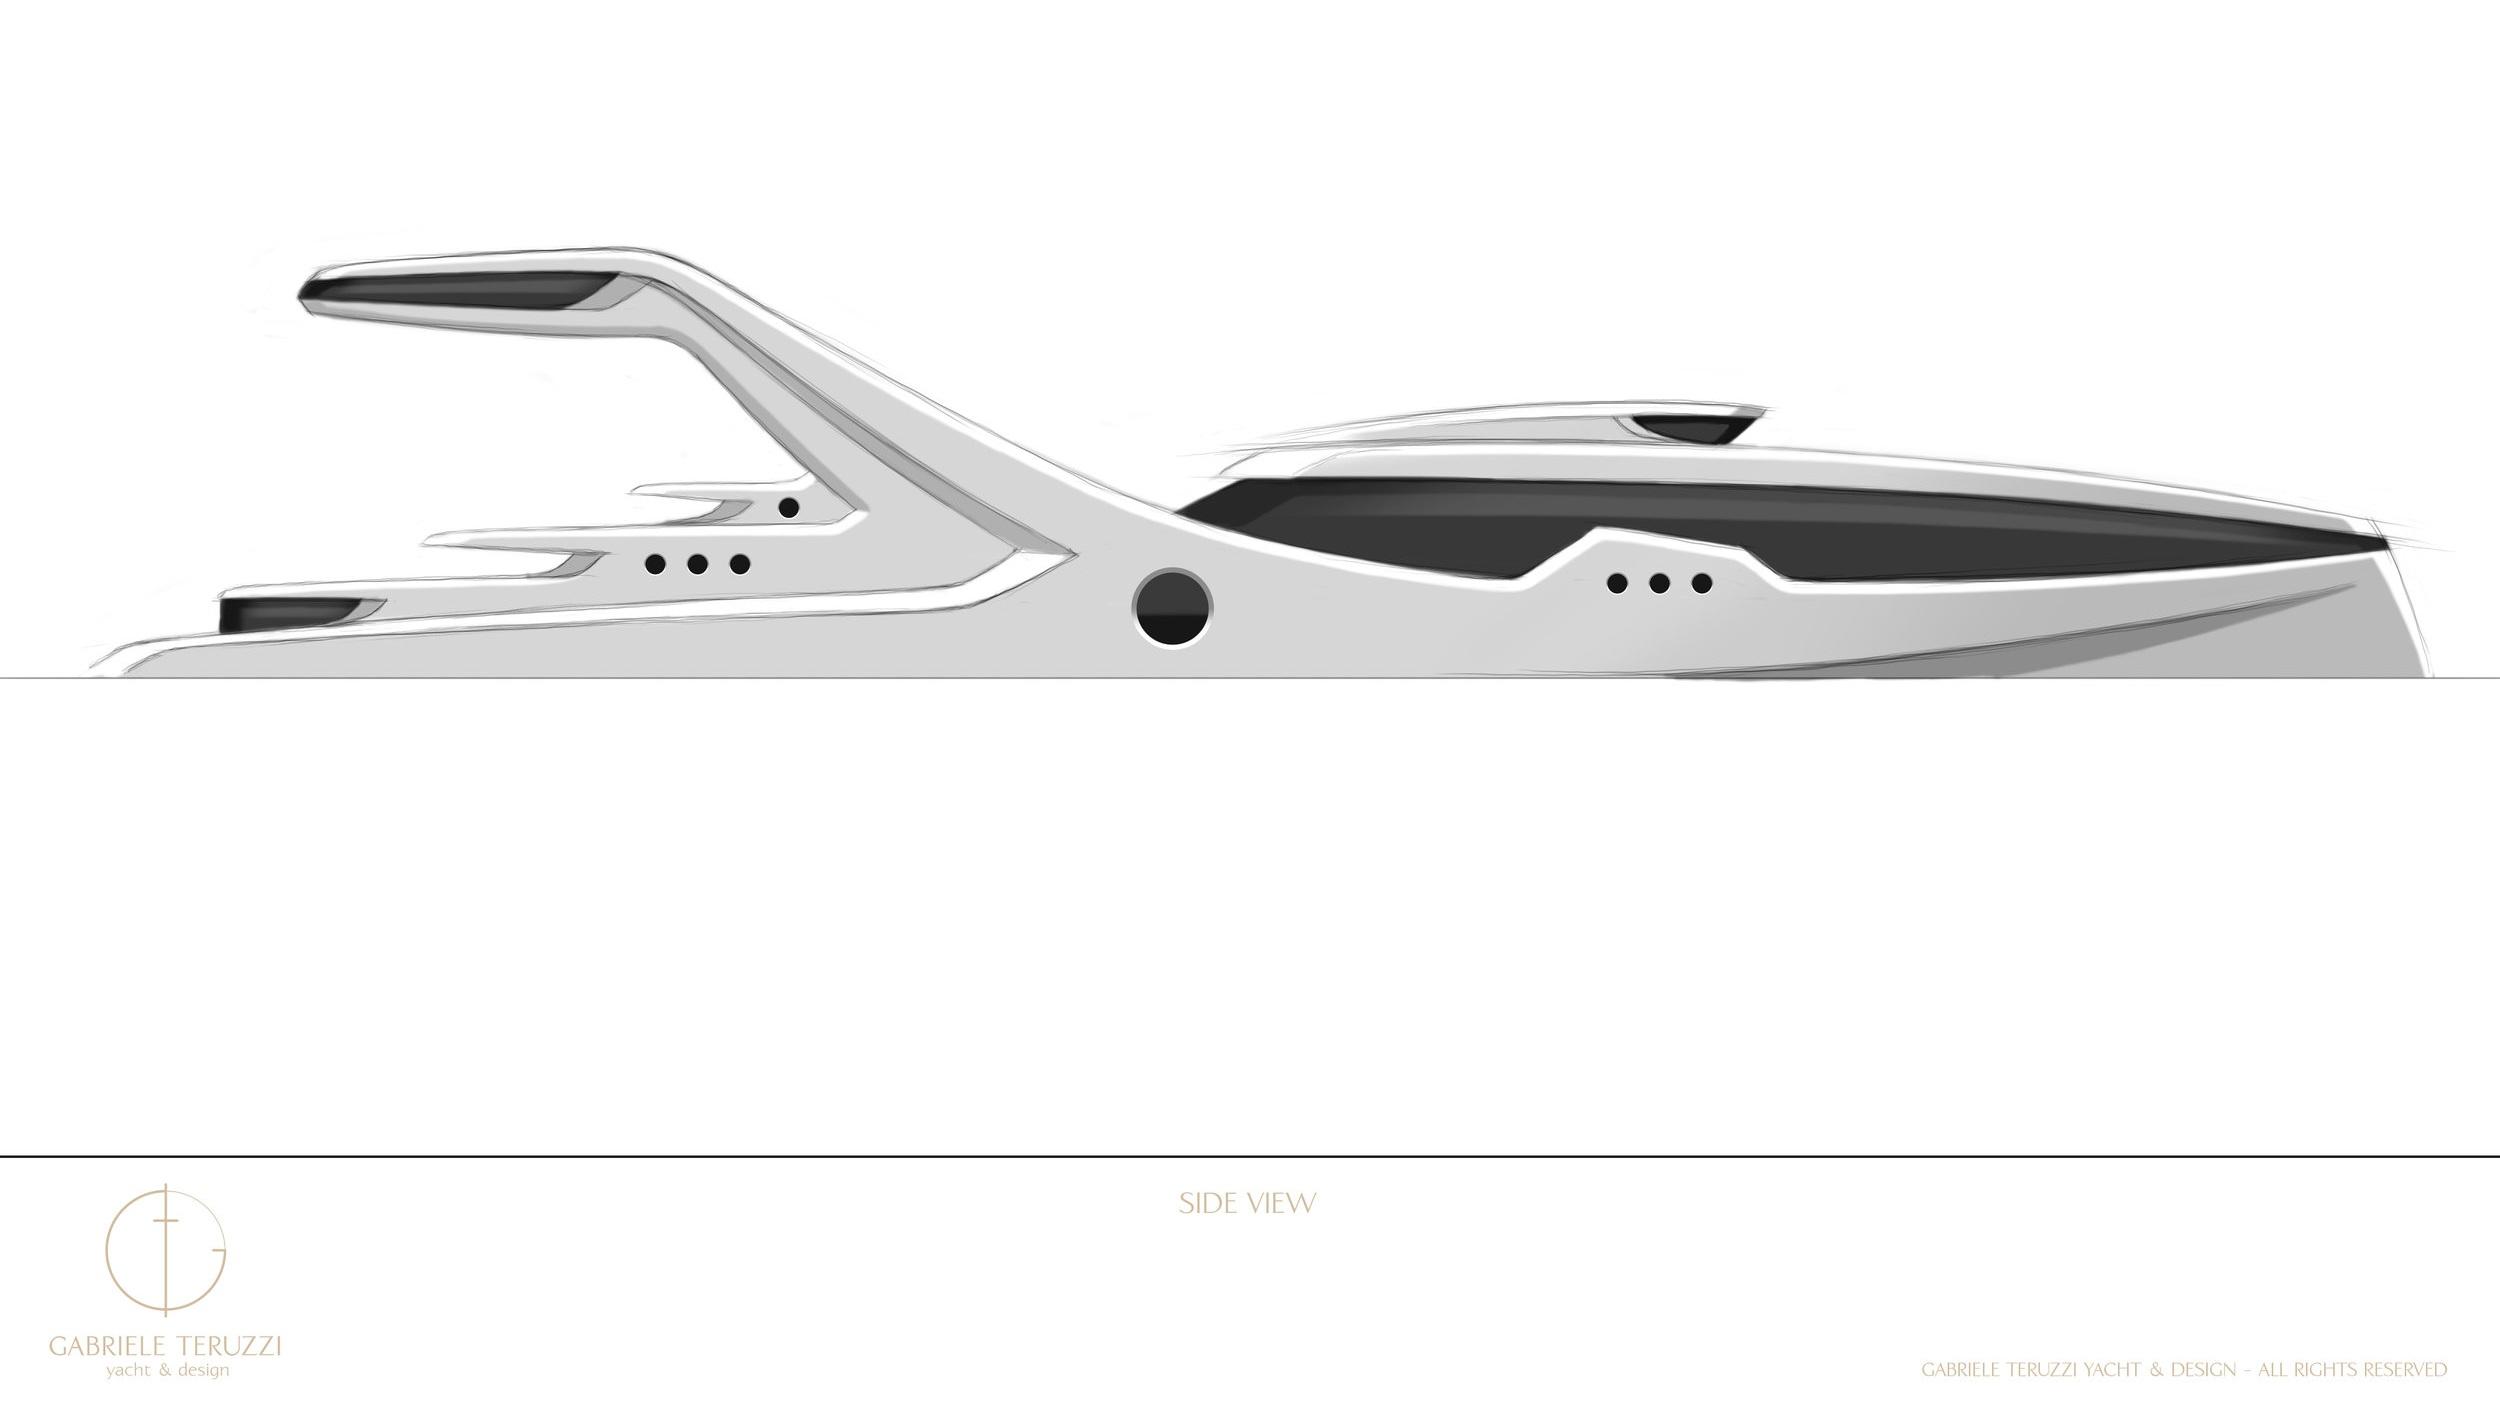 Projected chosen design of Oceanidi's E.M.P.V. by Gabriele Teruzzi.